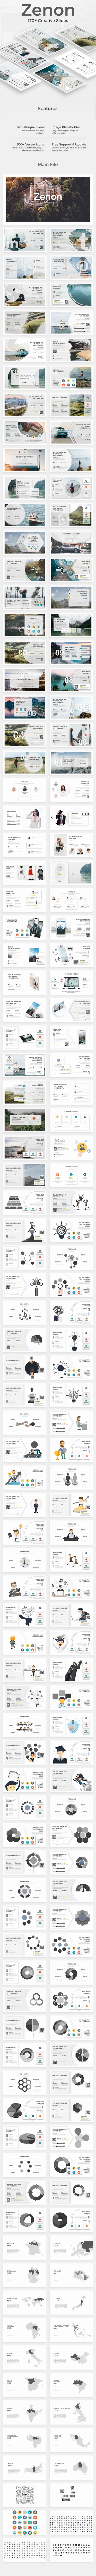 Zenon Creative Premium Google Slide Template - Google Slides Presentation Templates